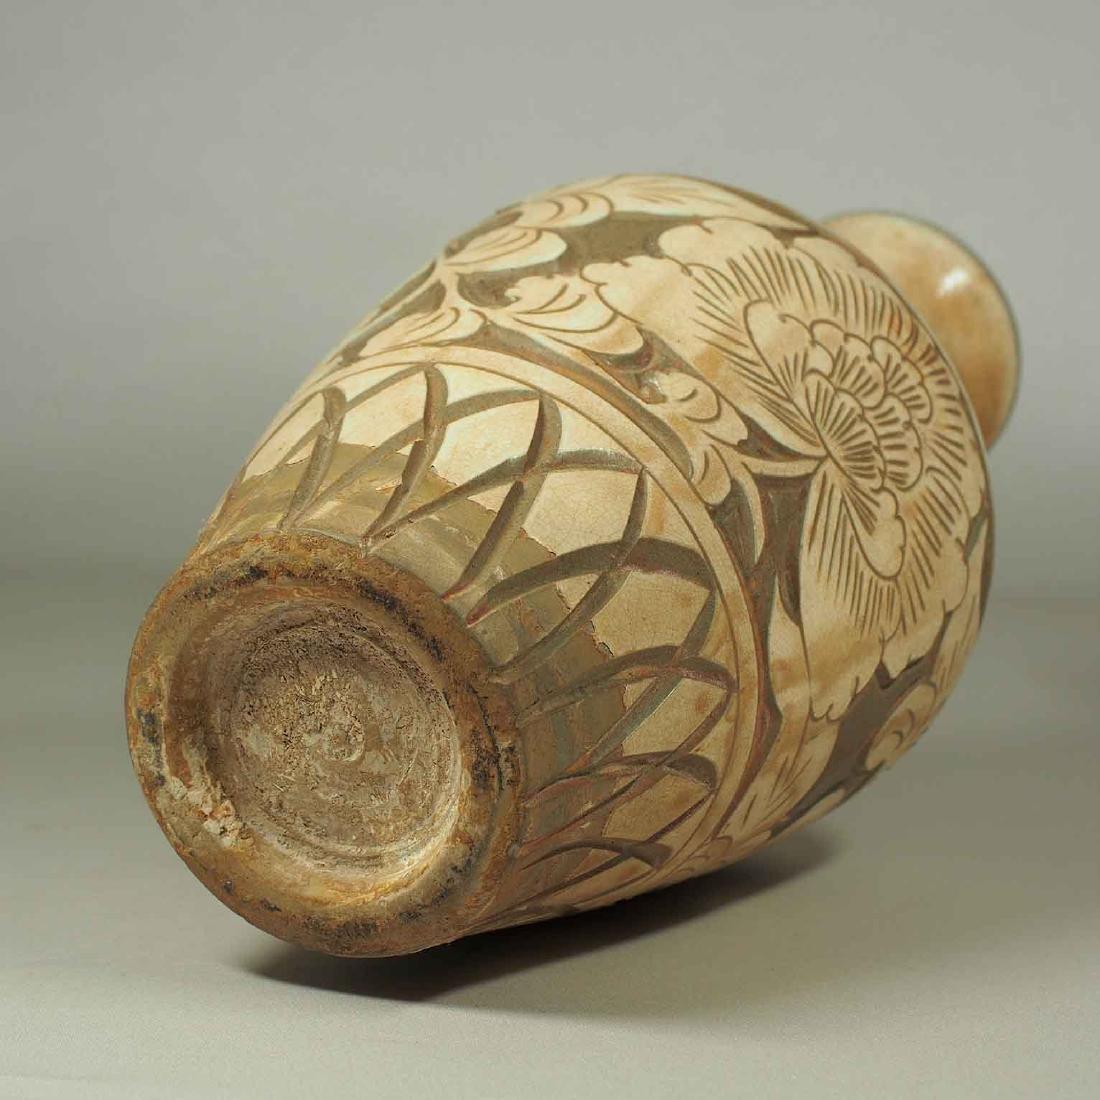 Cizhou Vase with Sgraffito Peony, Yuan Dynasty - 8